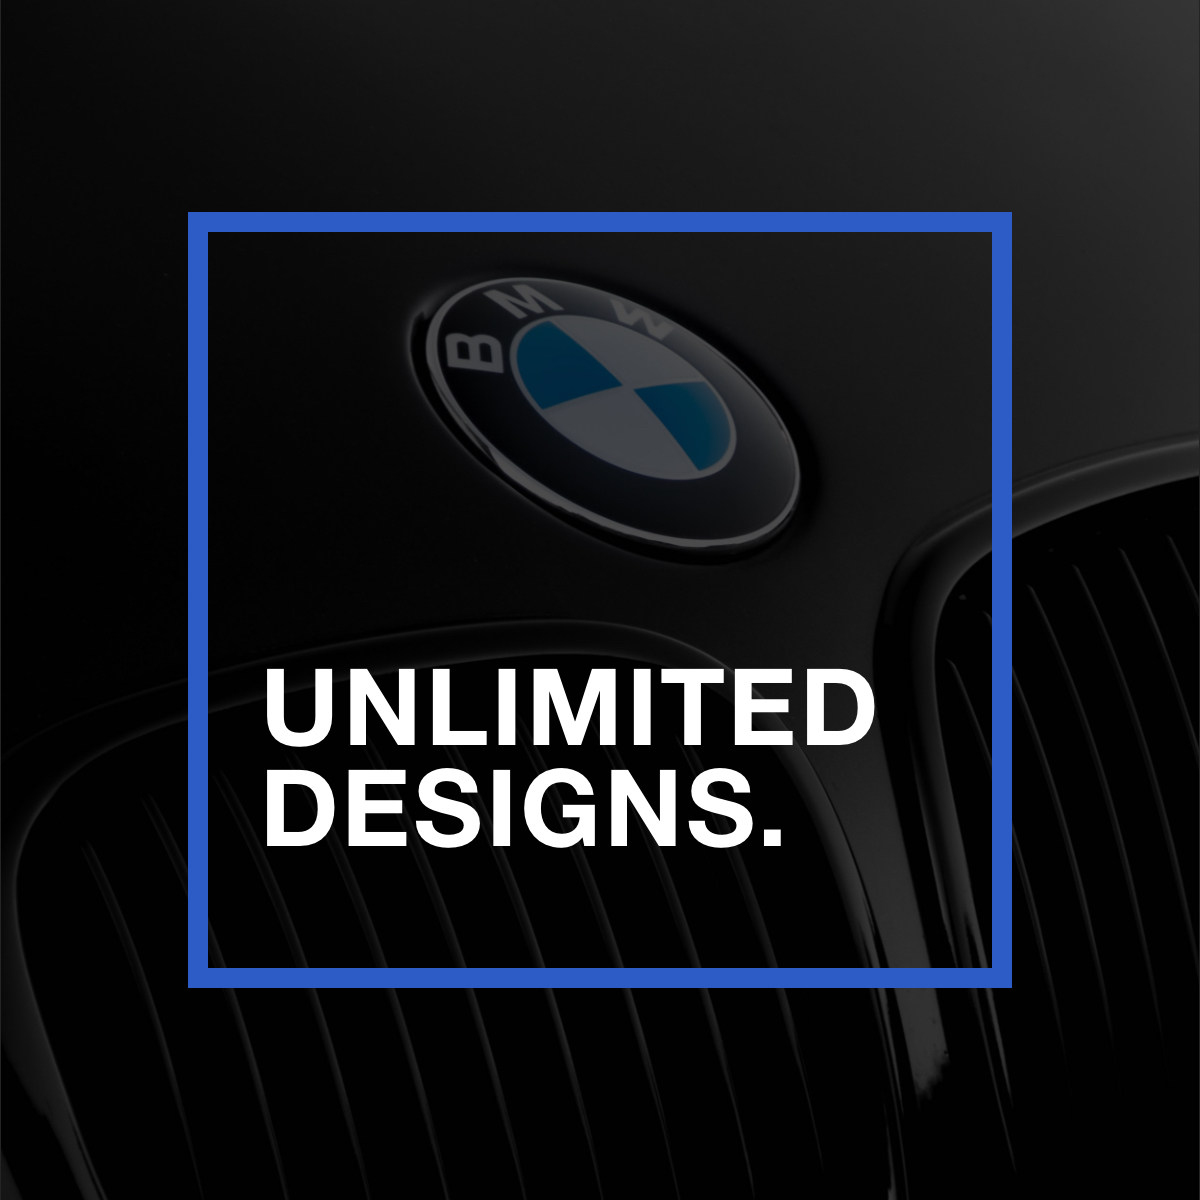 BMW-Google4.jpg